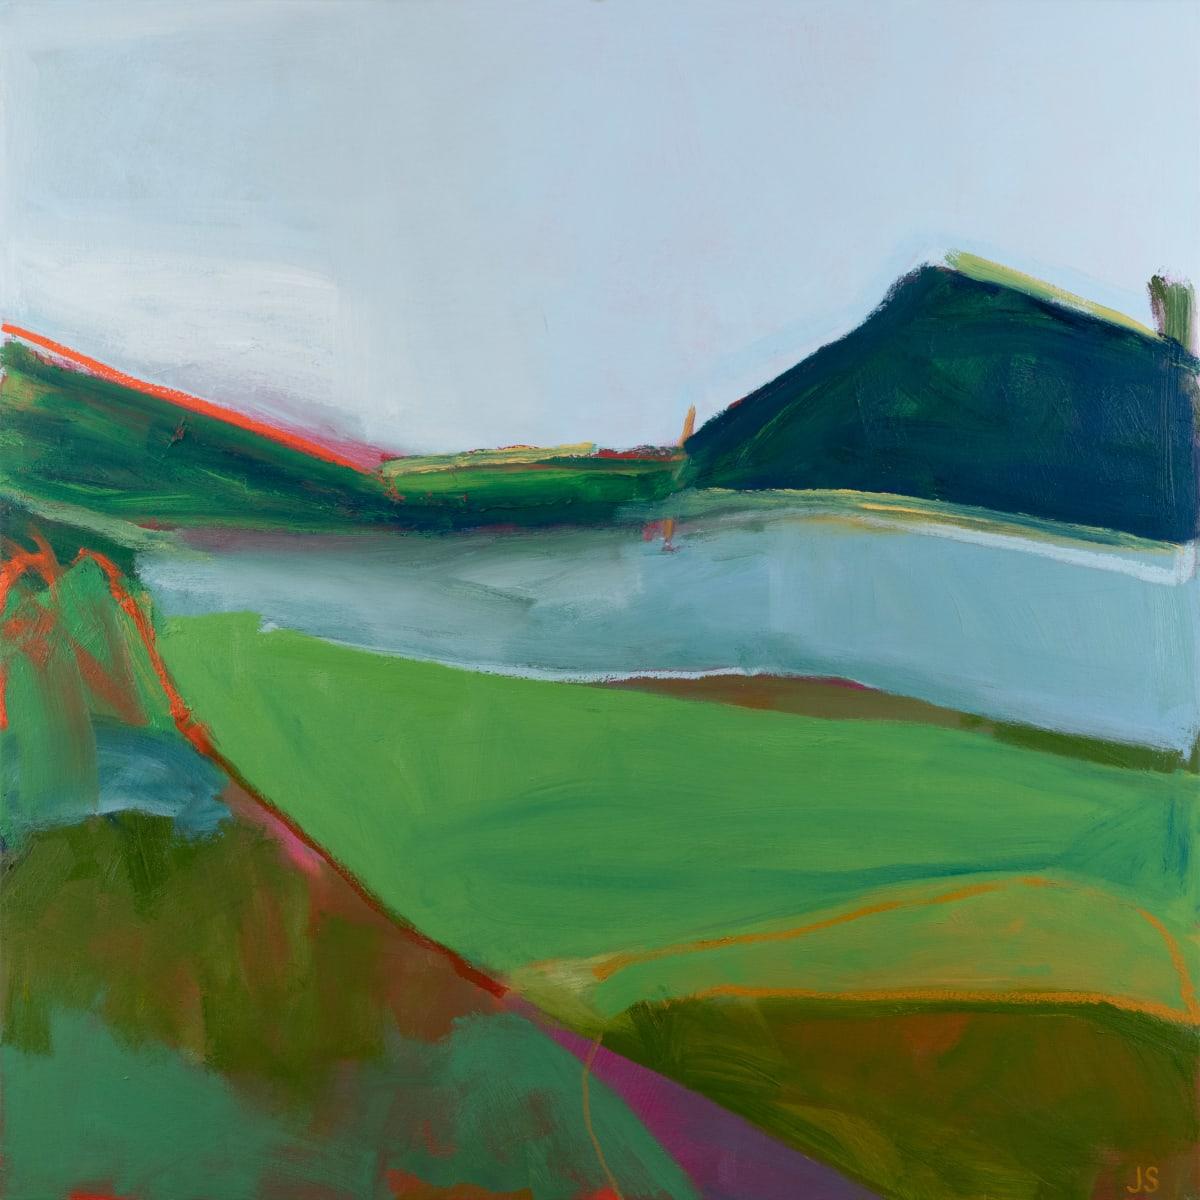 Where the Fields Begin by Jessica Singerman